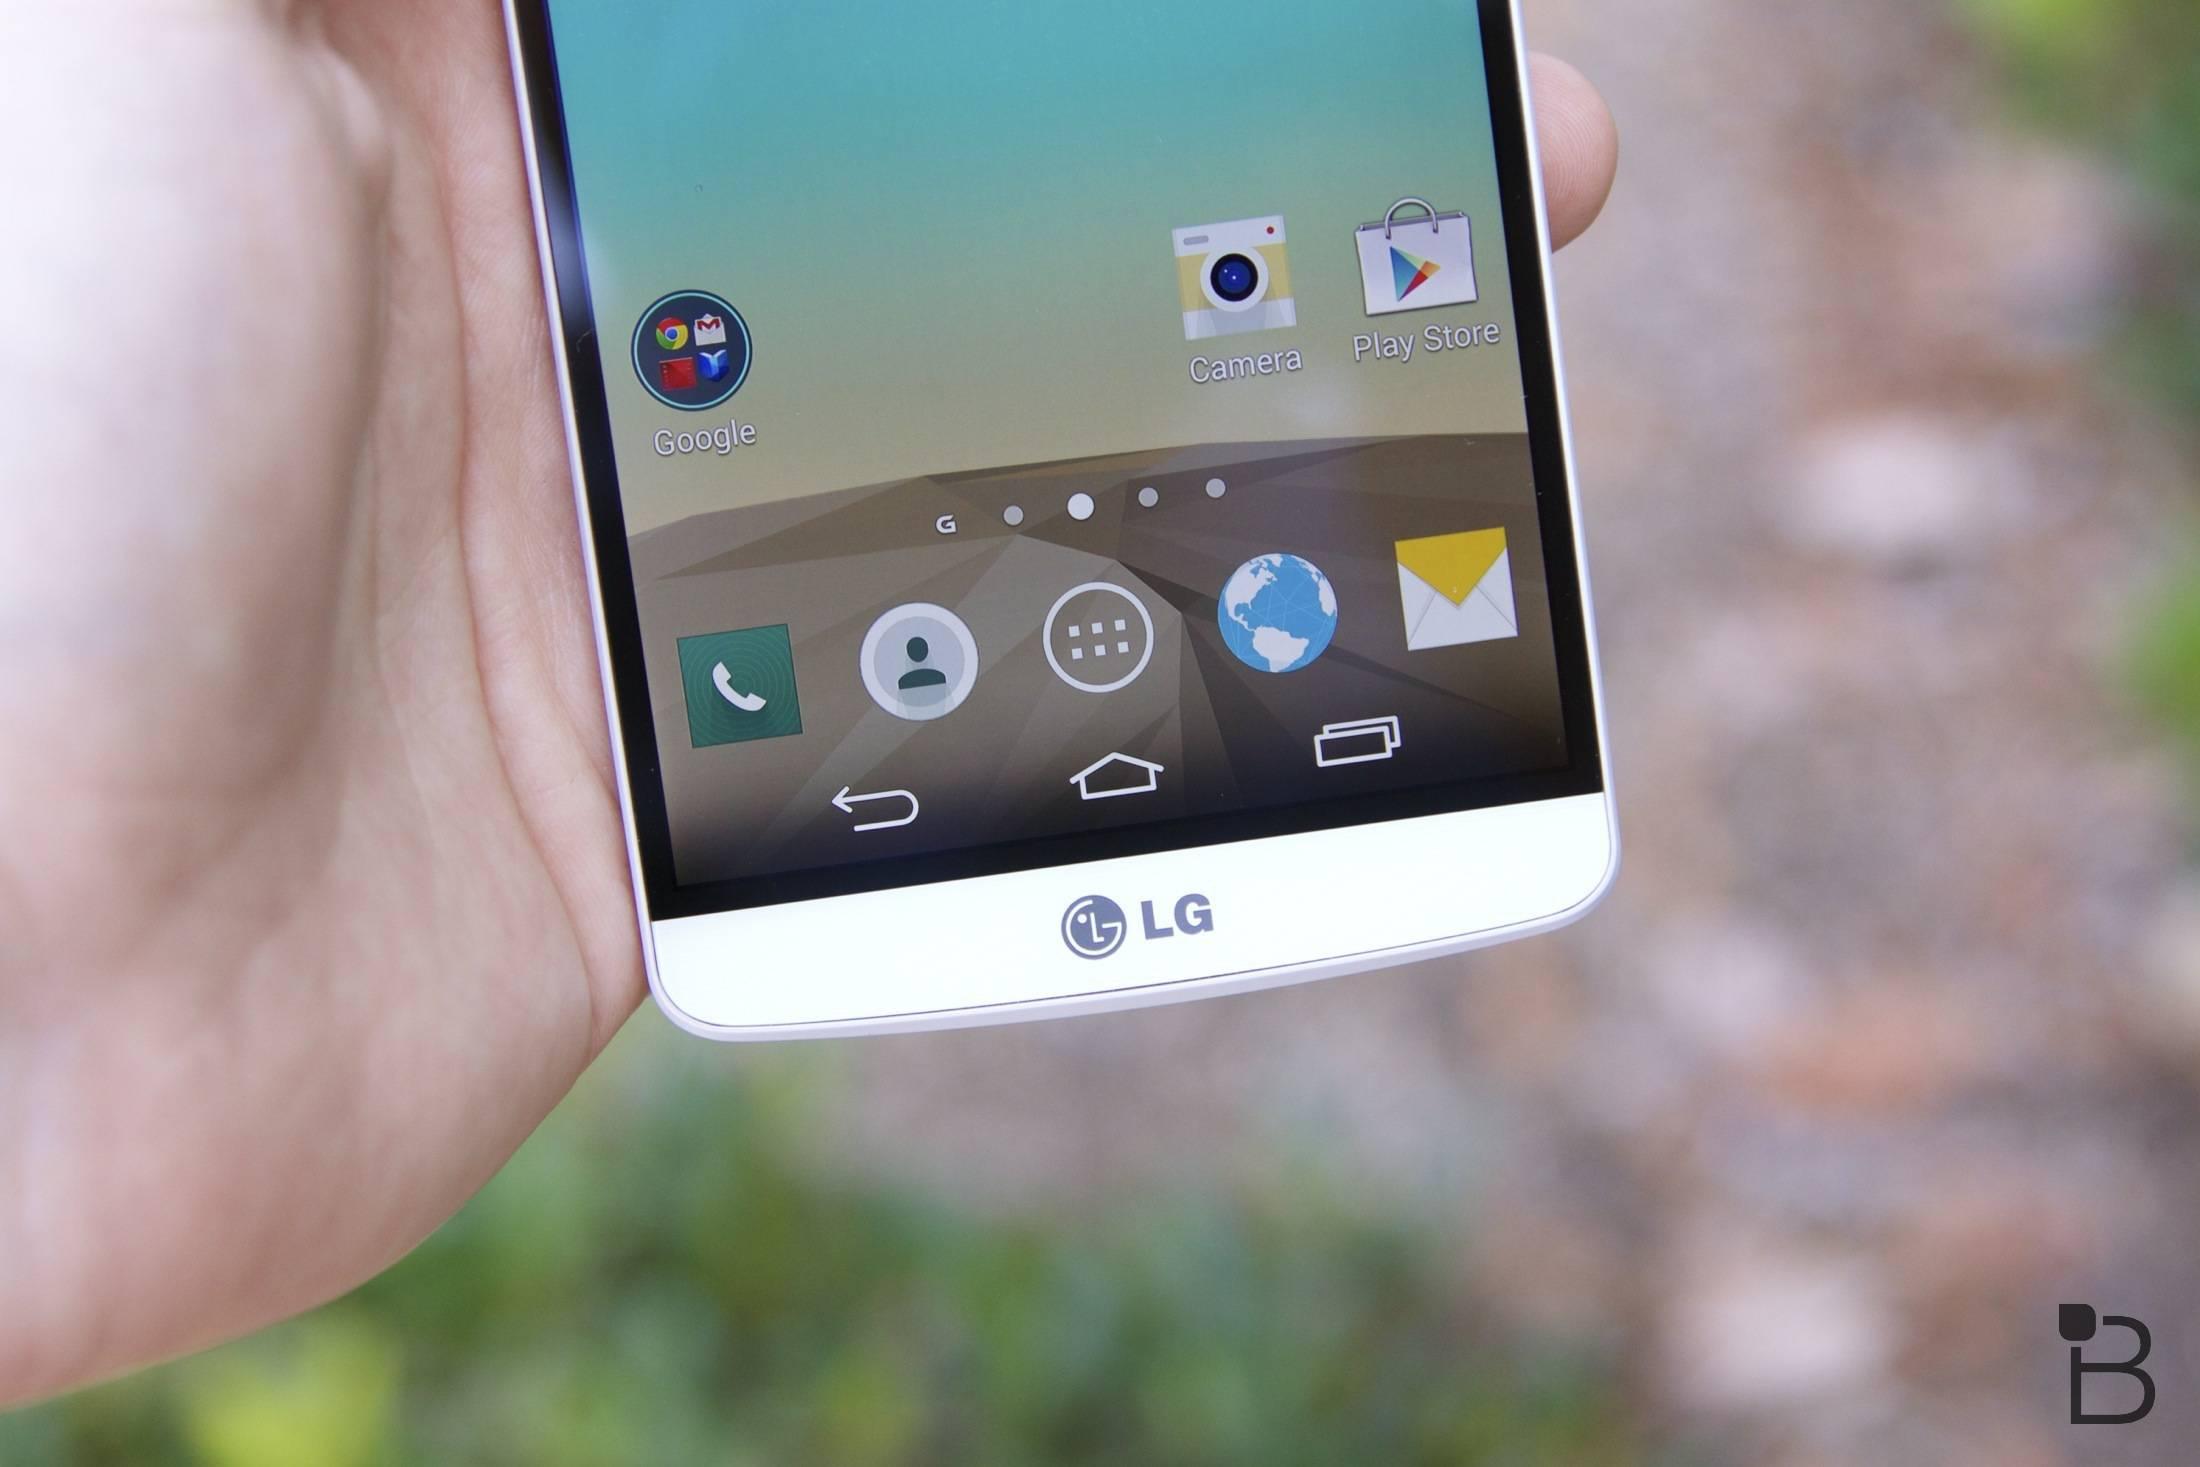 (Source:  TechnoBuffalo ) The LG G3